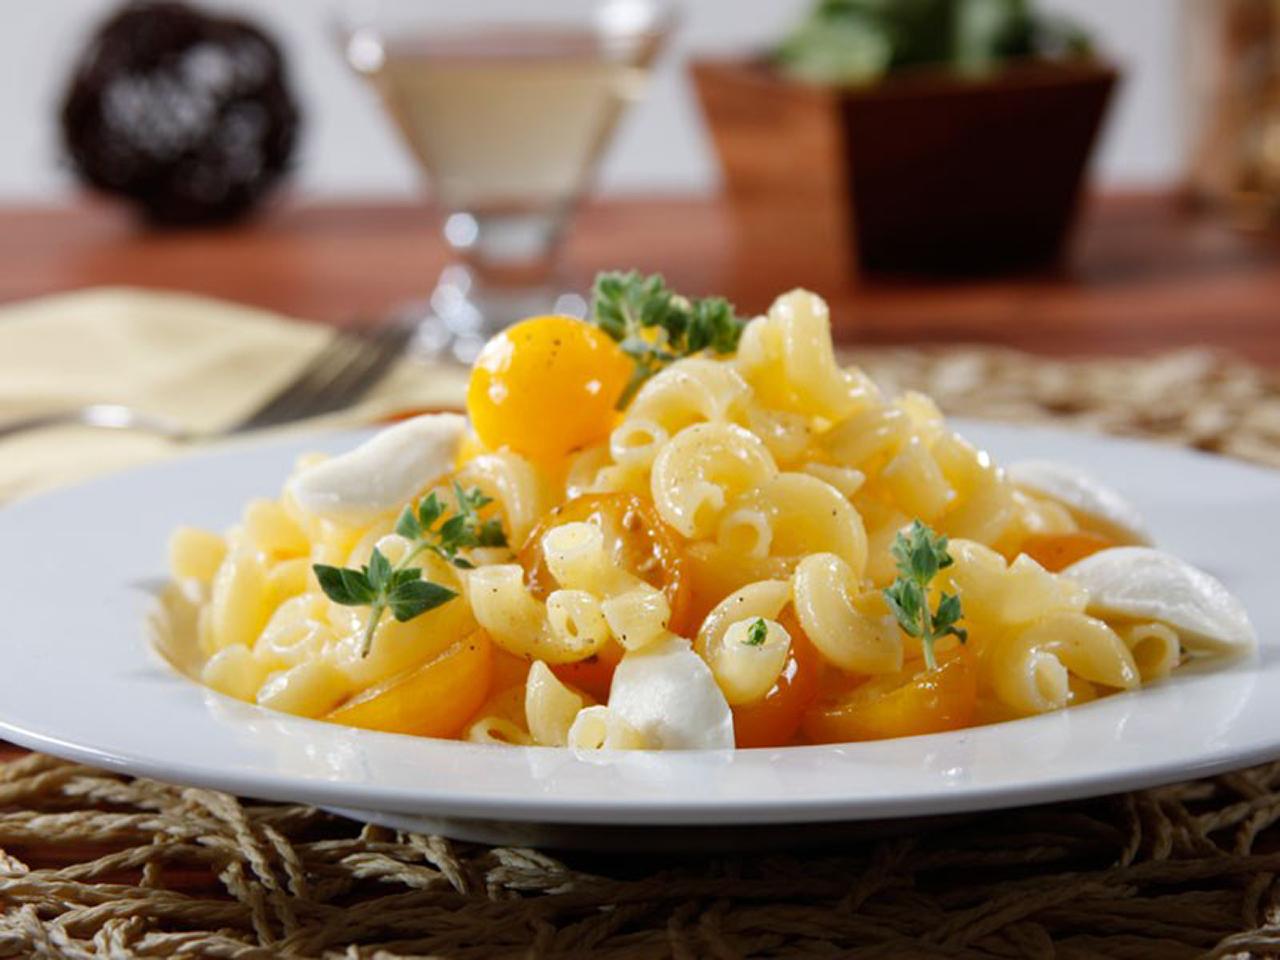 Barilla® Gluten Free Elbows Pasta Salad with Yellow Cherry Tomatoes, Fresh Oregano & Baby Mozzarella Barilla Canada